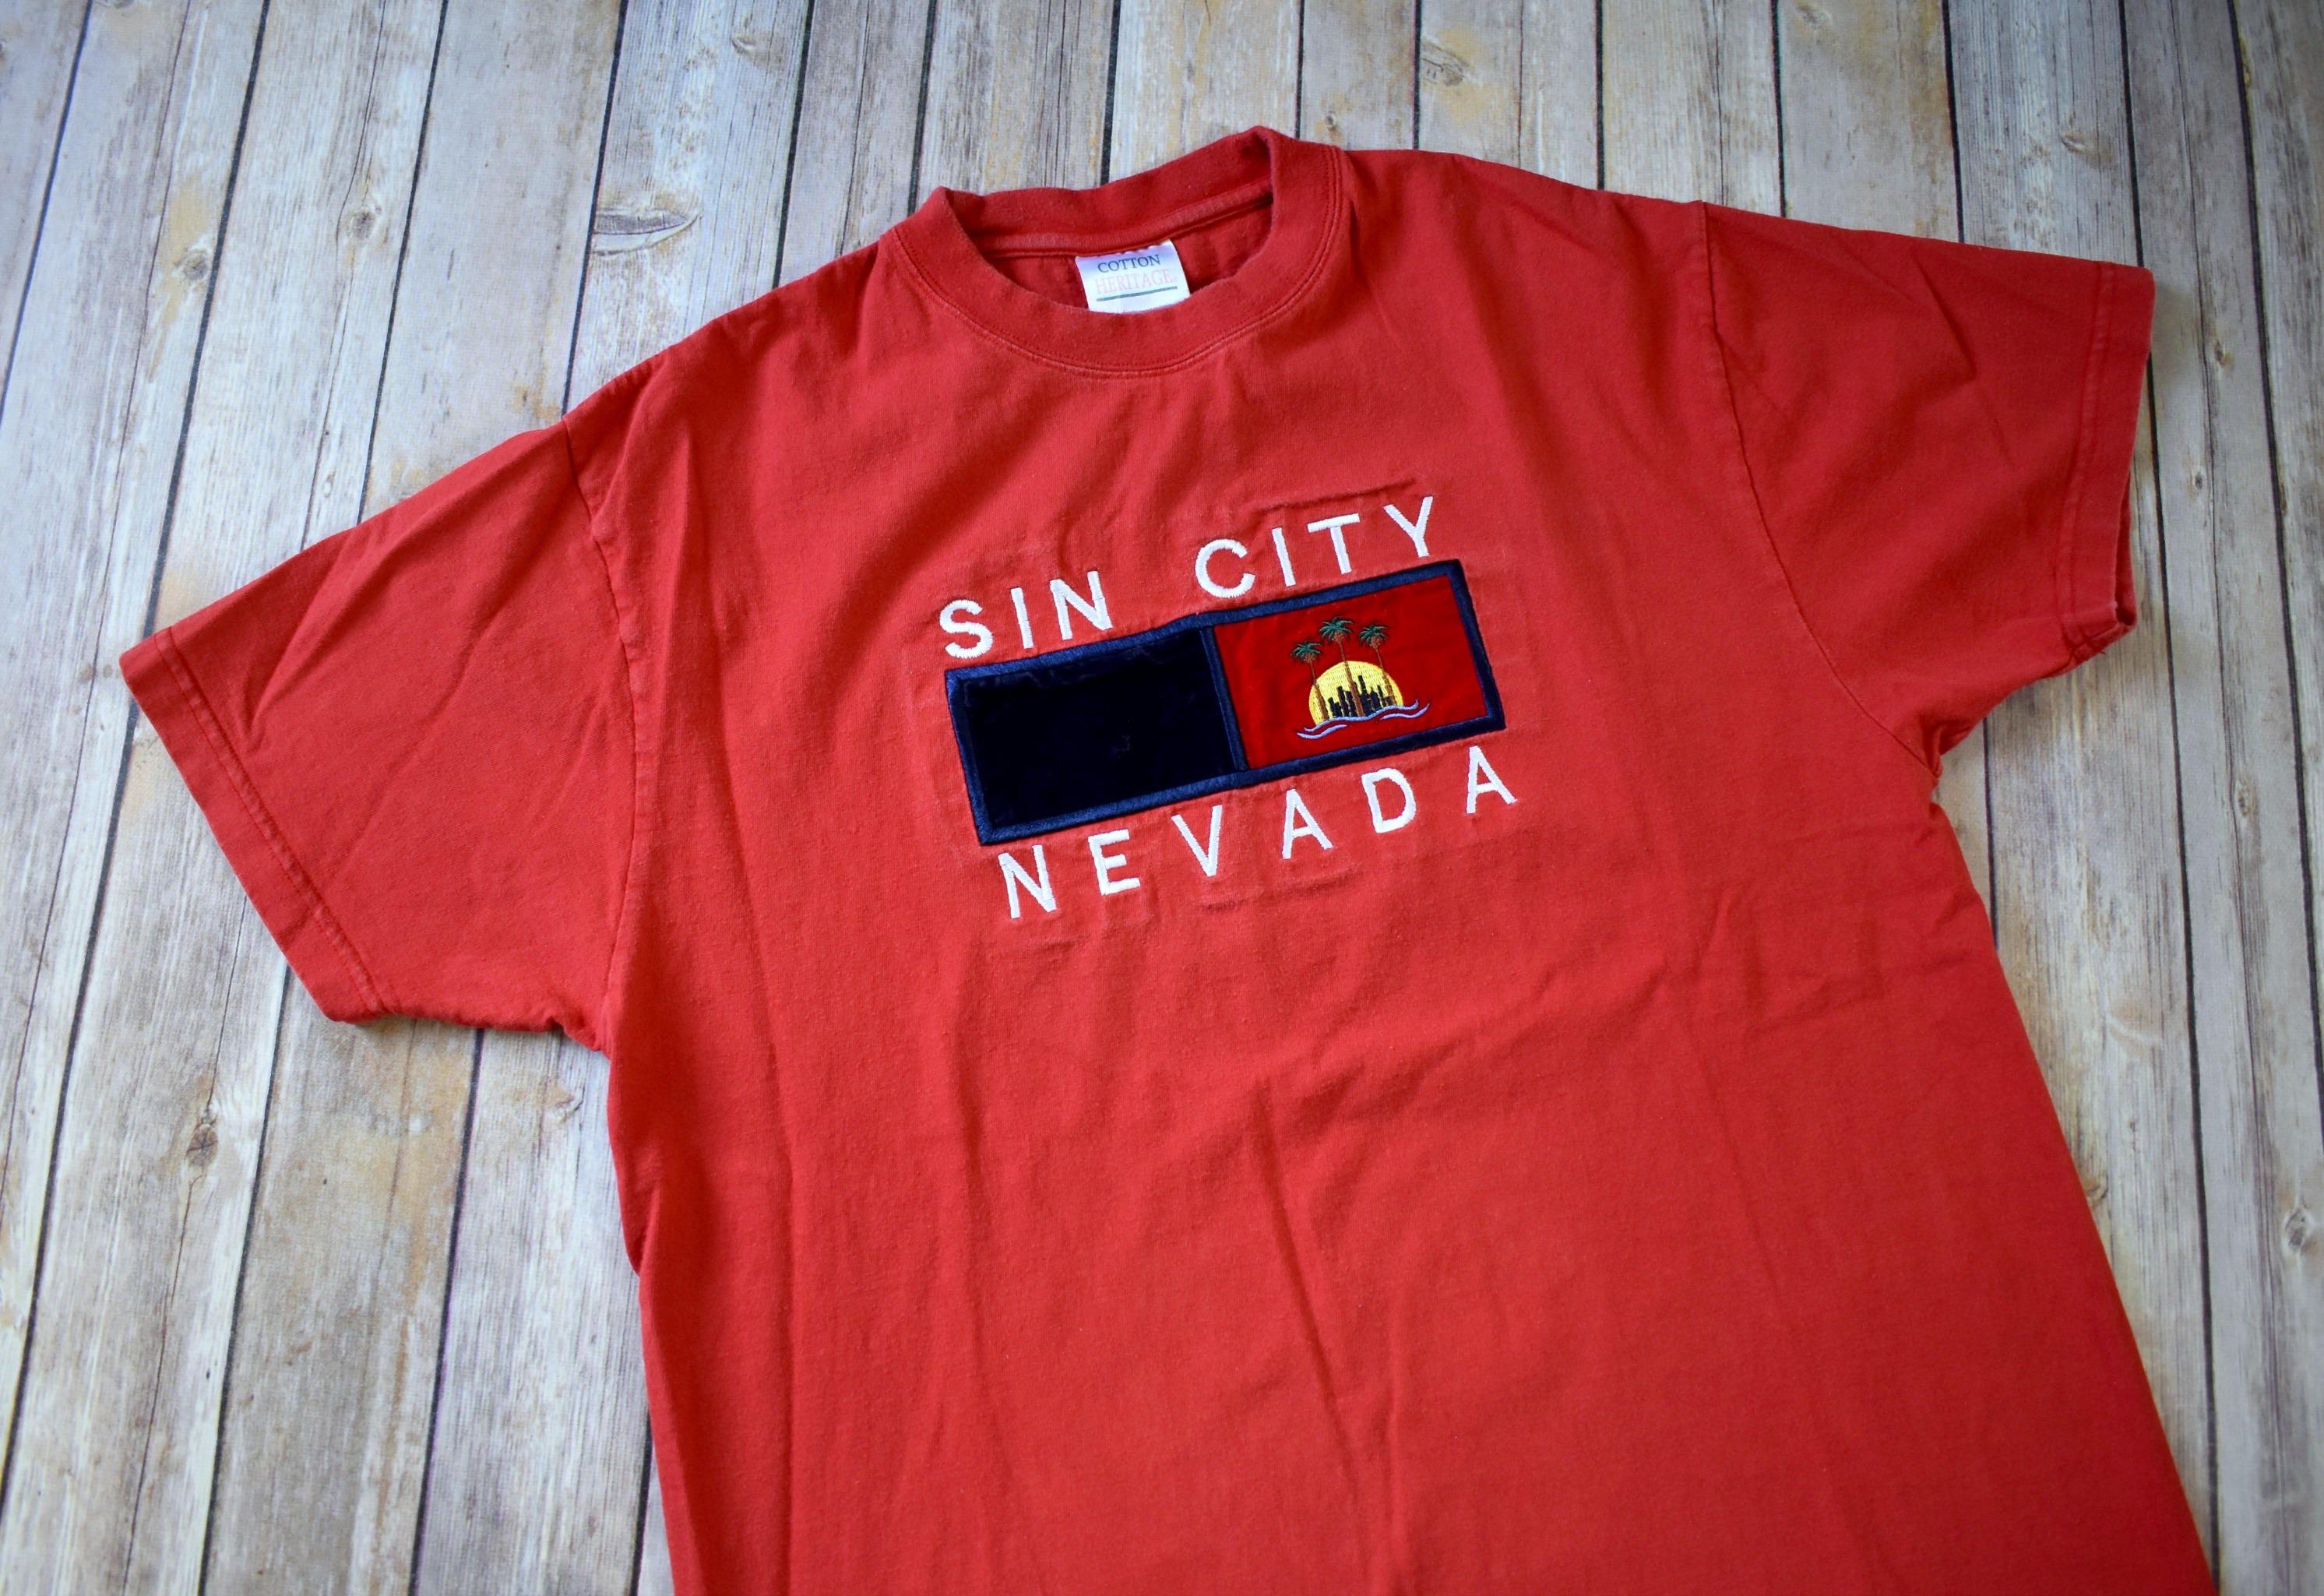 46b96141 90s SIN CITY NEVADA T-Shirt // Size Medium Mens Womens // | Etsy